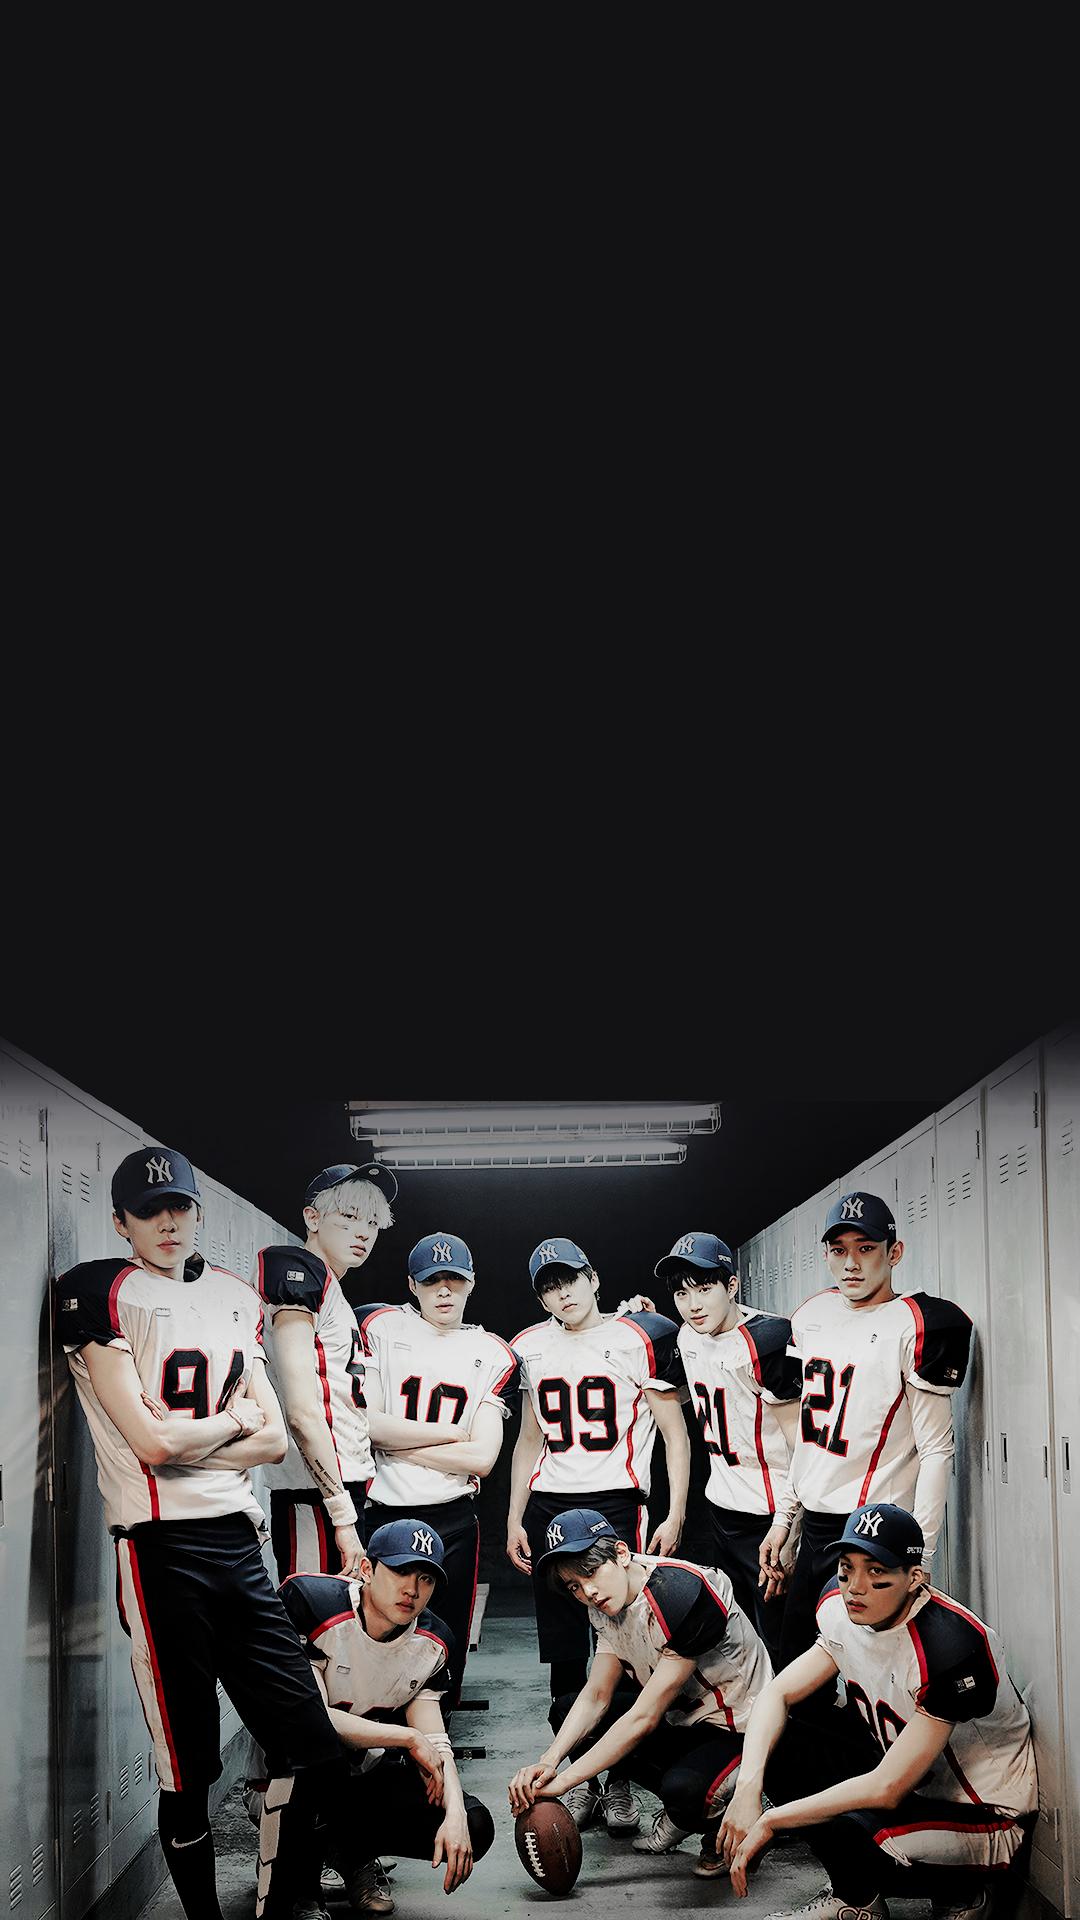 Exo Iphone Wallpaper Exo Pinterest Exo Exo Members